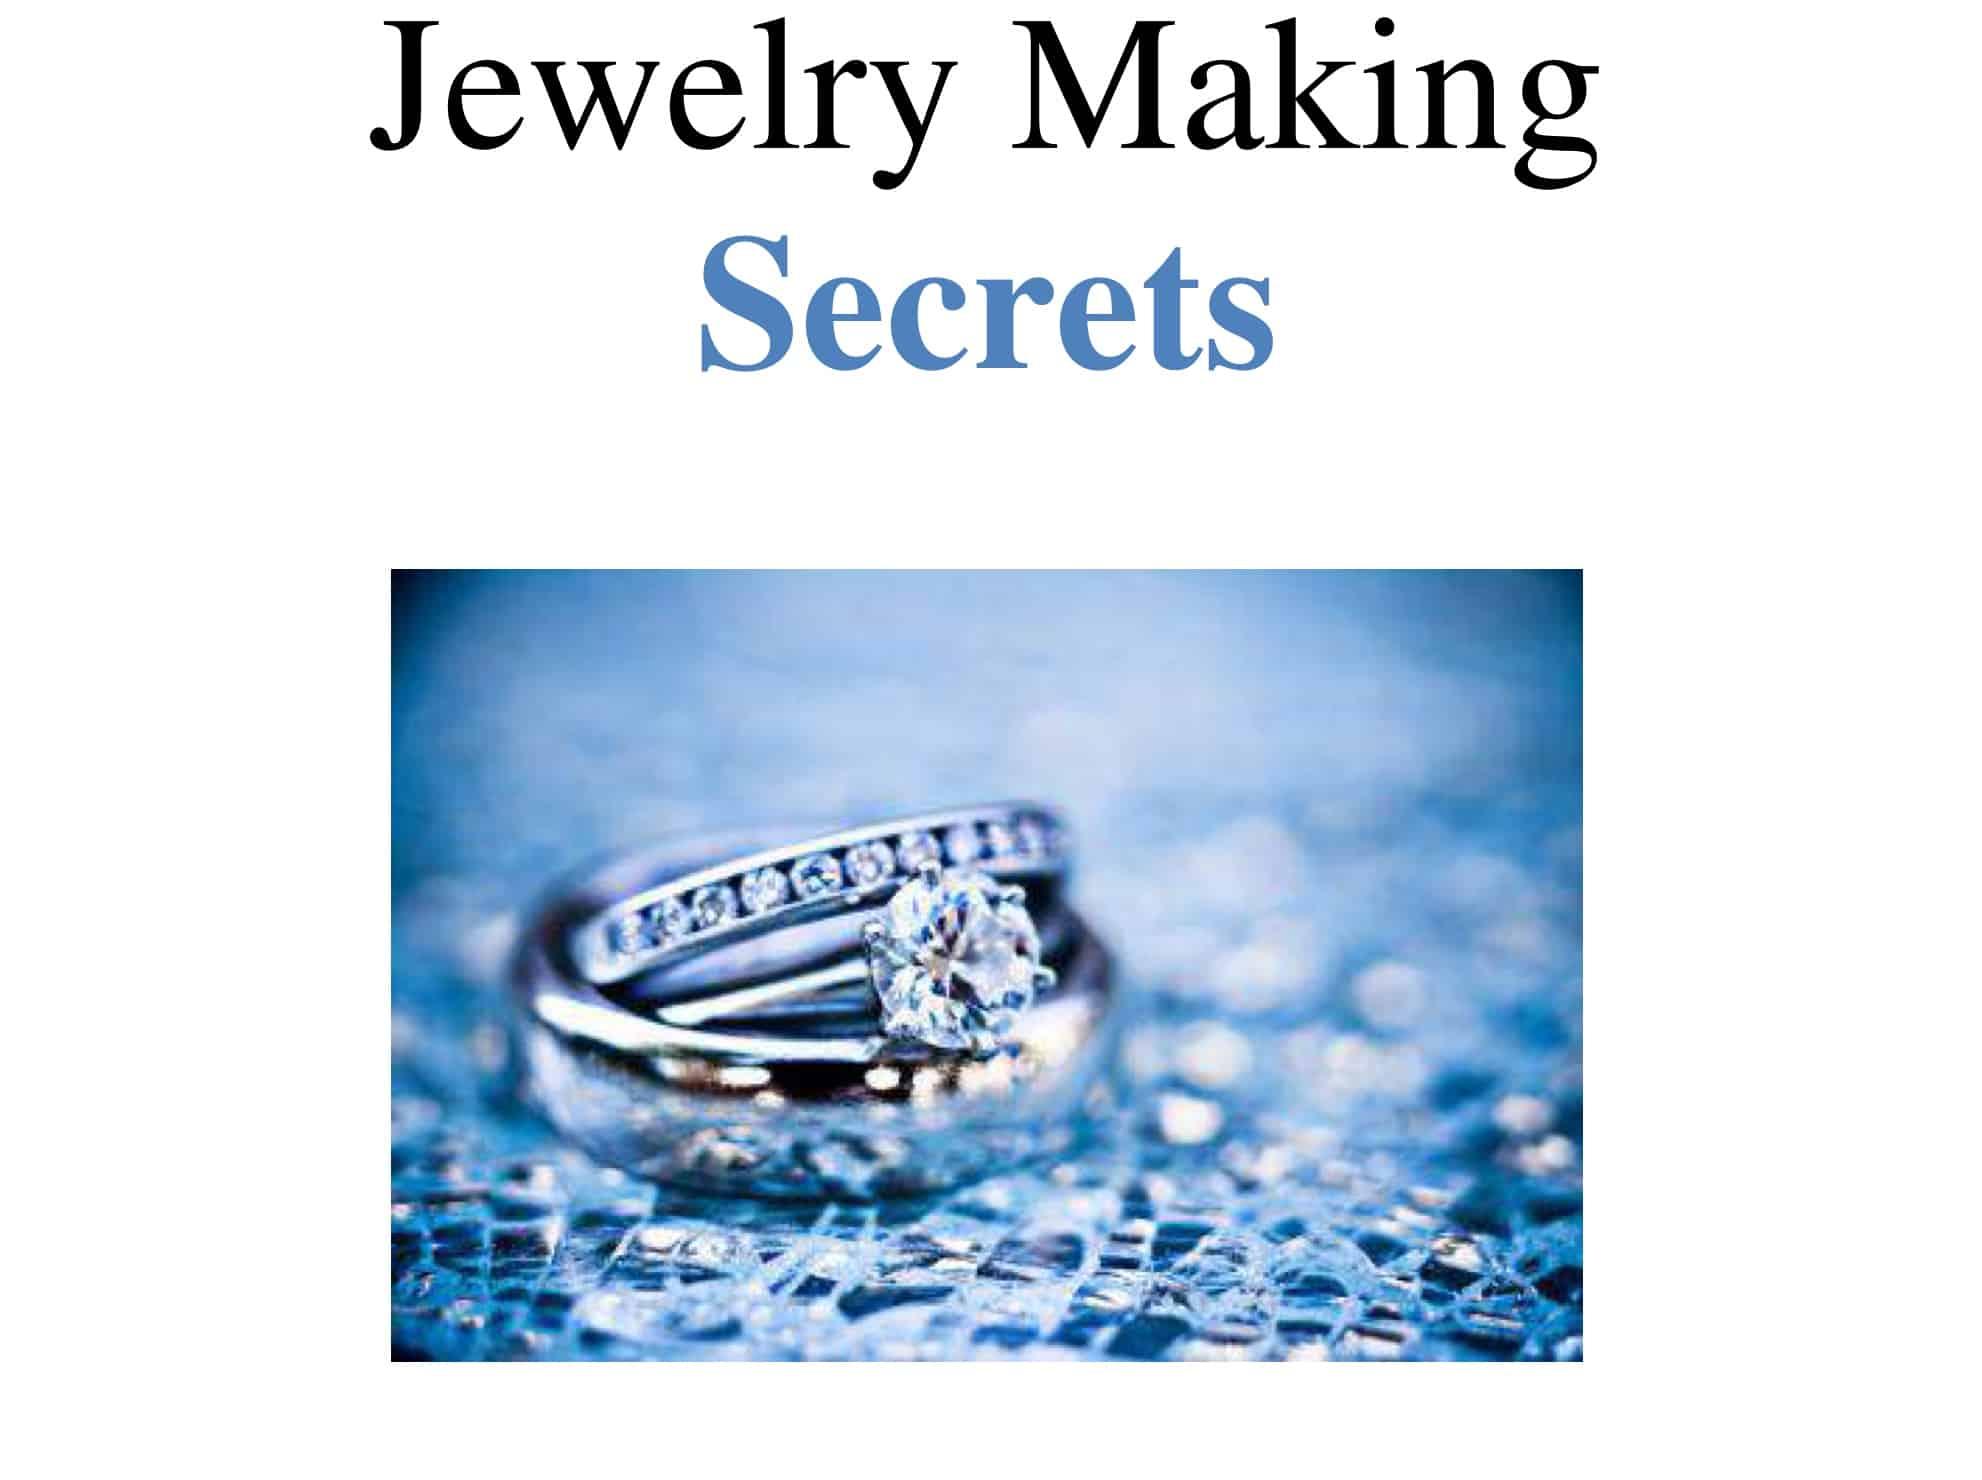 Jewelry Making Secrets Free Gift